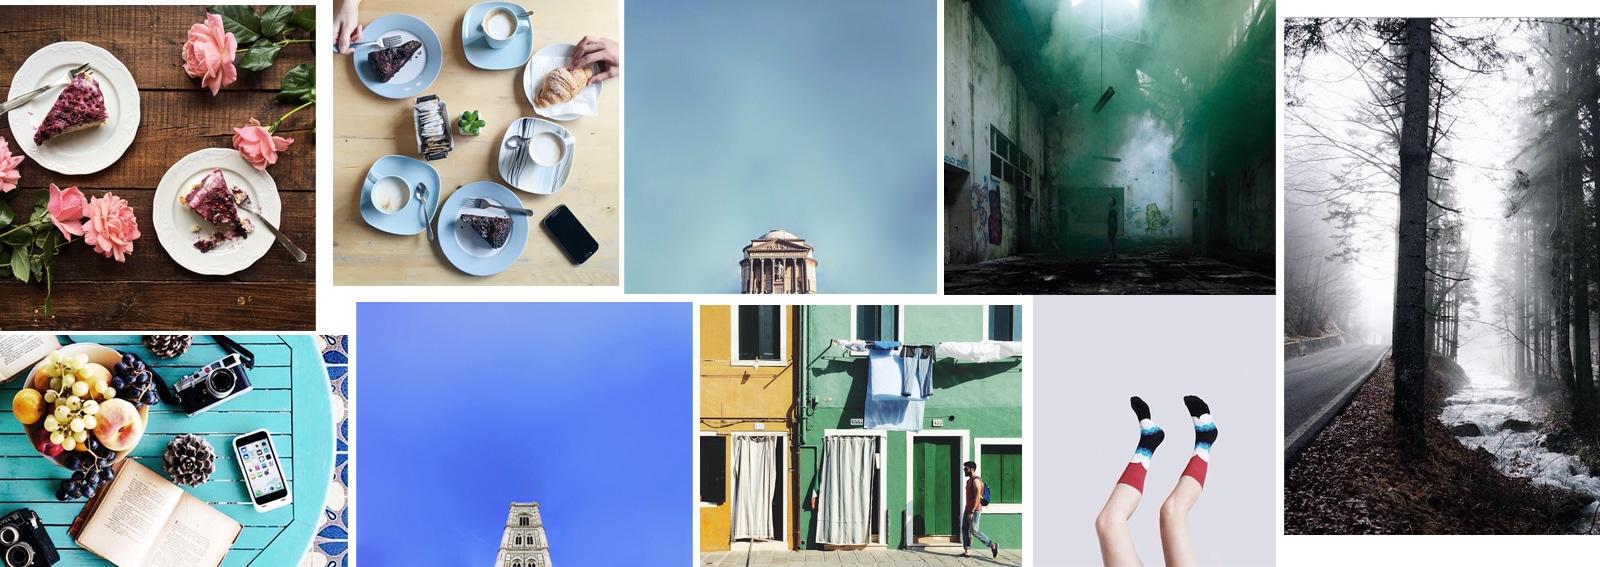 cover-design-di-instagram-ottobre-15-desktop